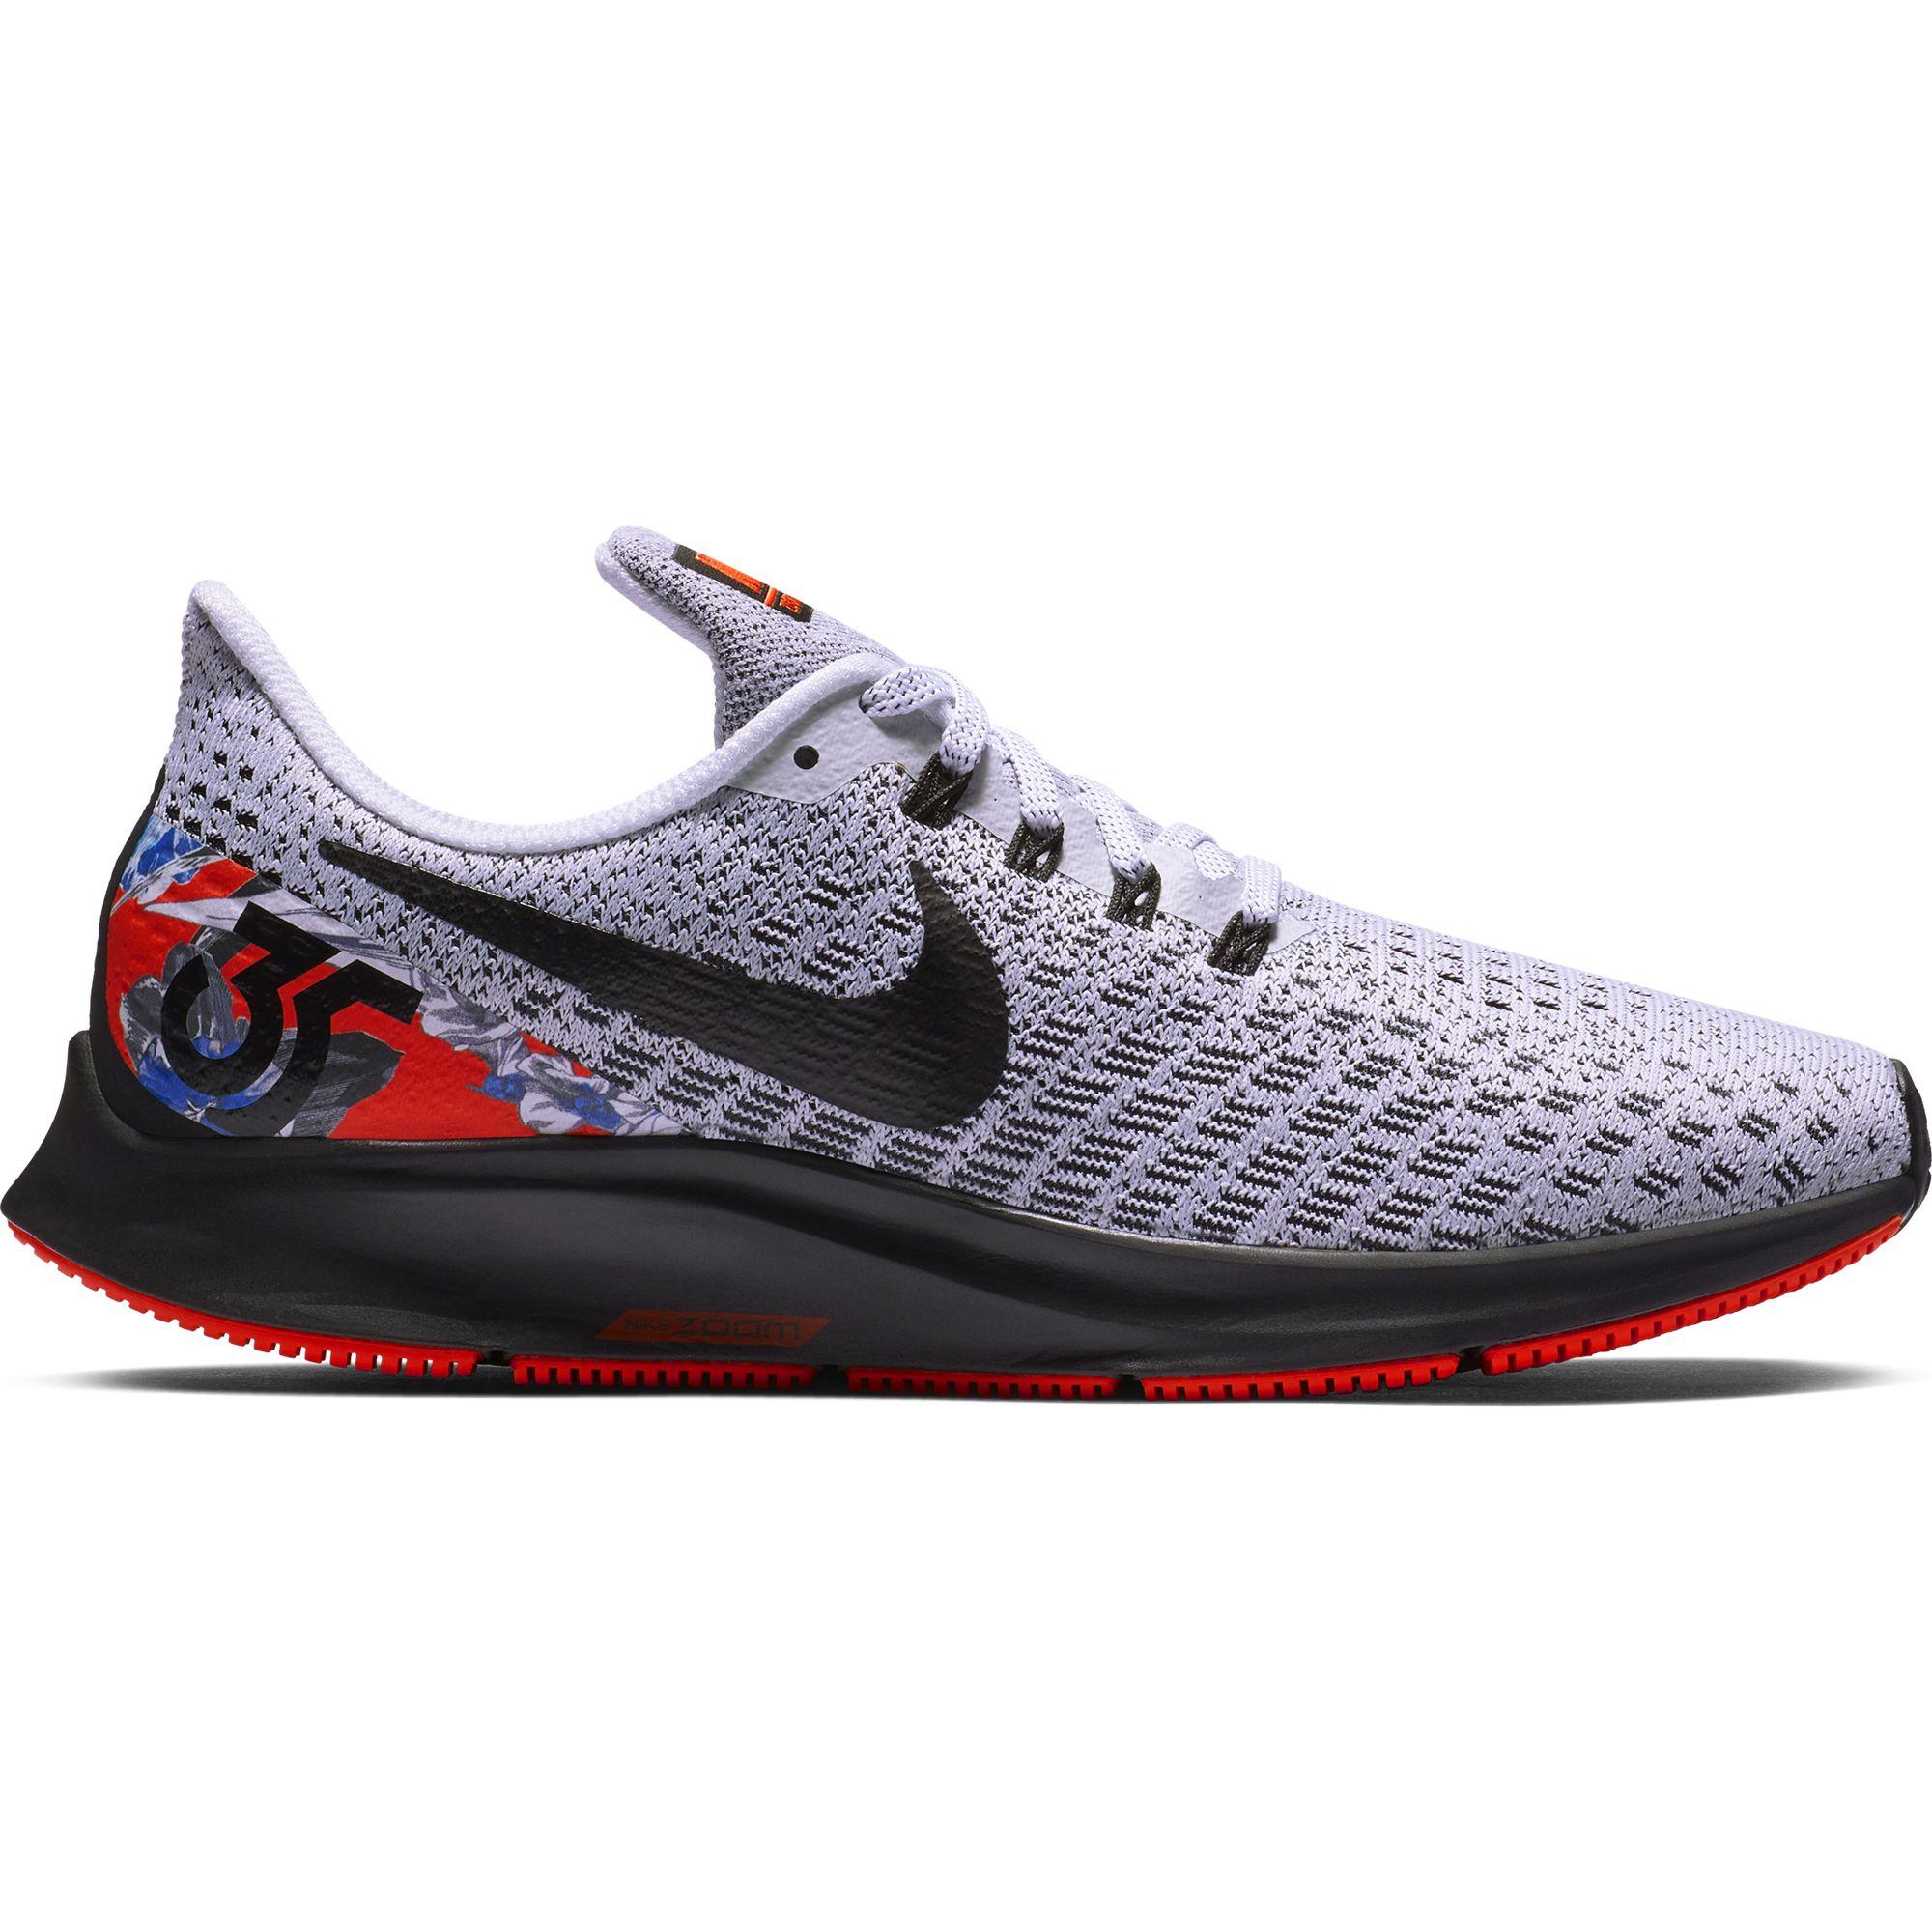 420b942a7 Nike Women's Nike Air Zoom Pegasus 35 Floral Sneakers, White/ Black ...